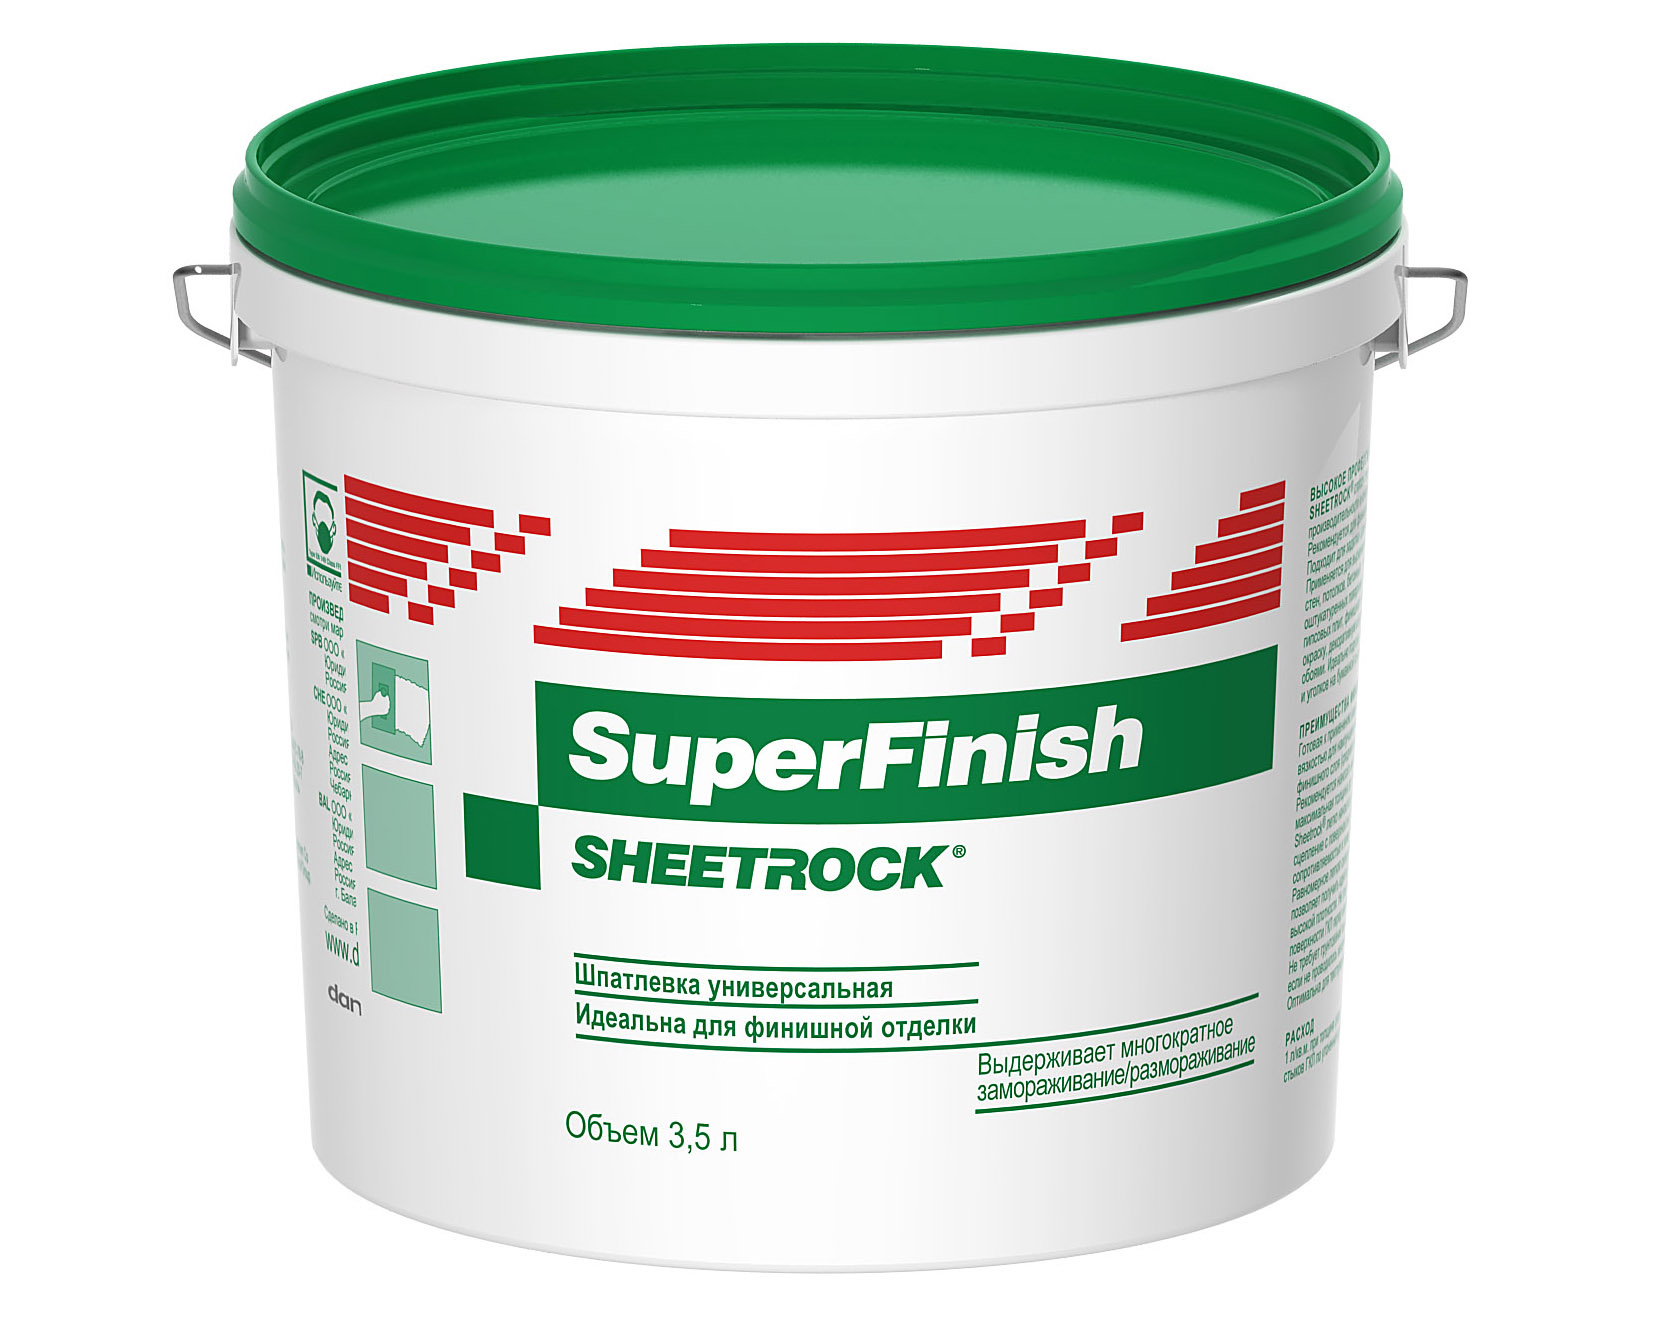 Шпаклевка Sheetrock SuperFinish